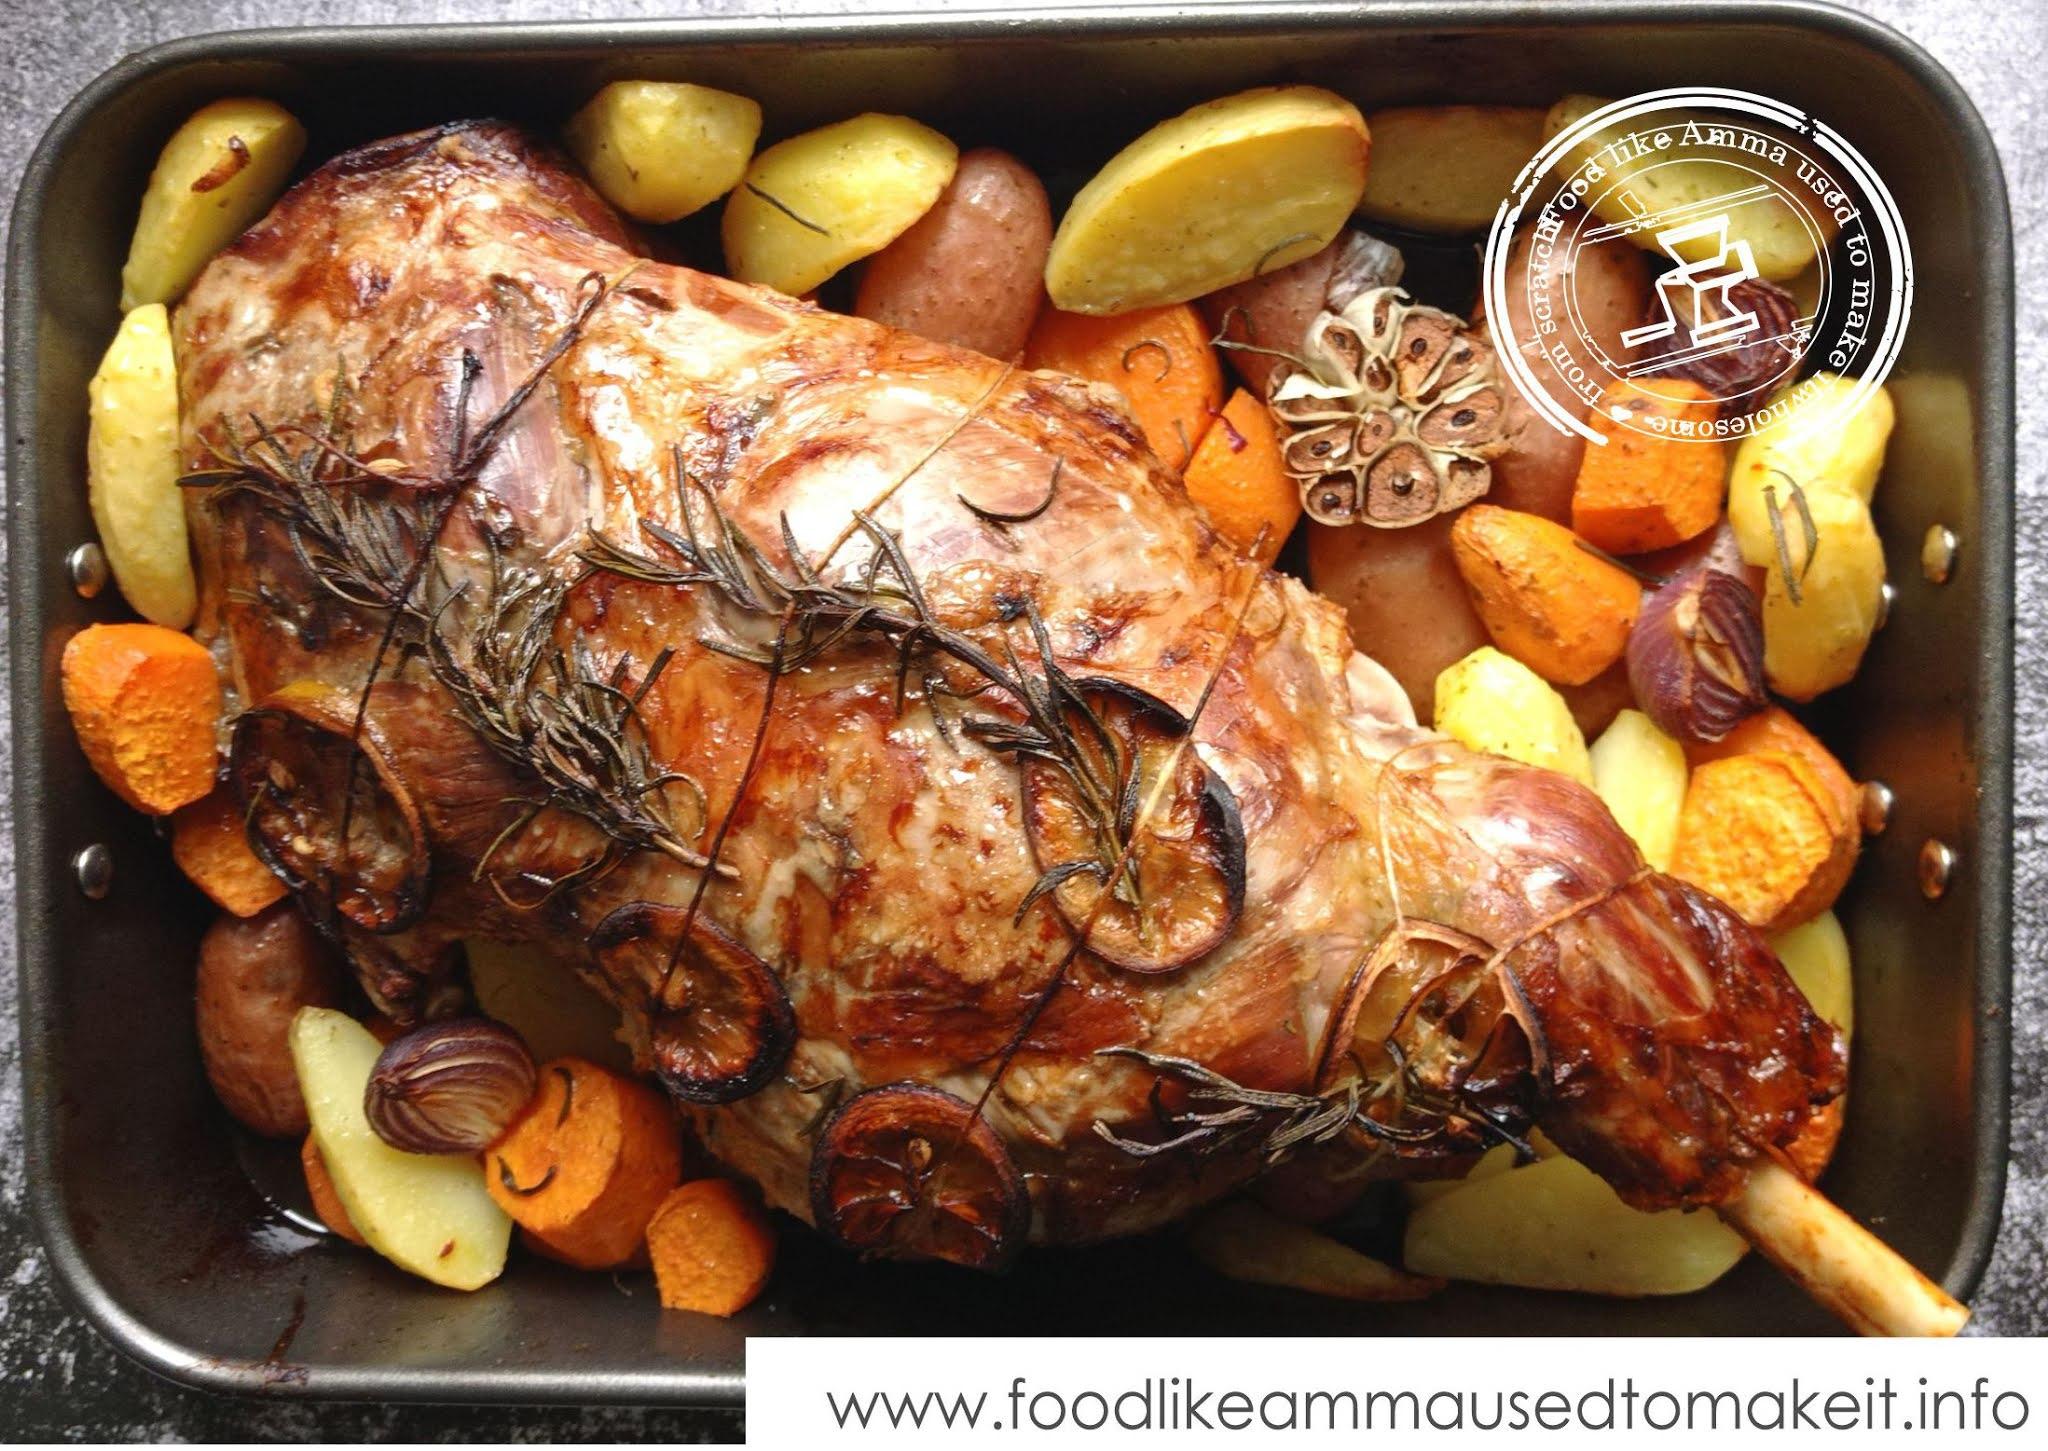 Leg of Lamb with Rosemary Garlic and Lemon